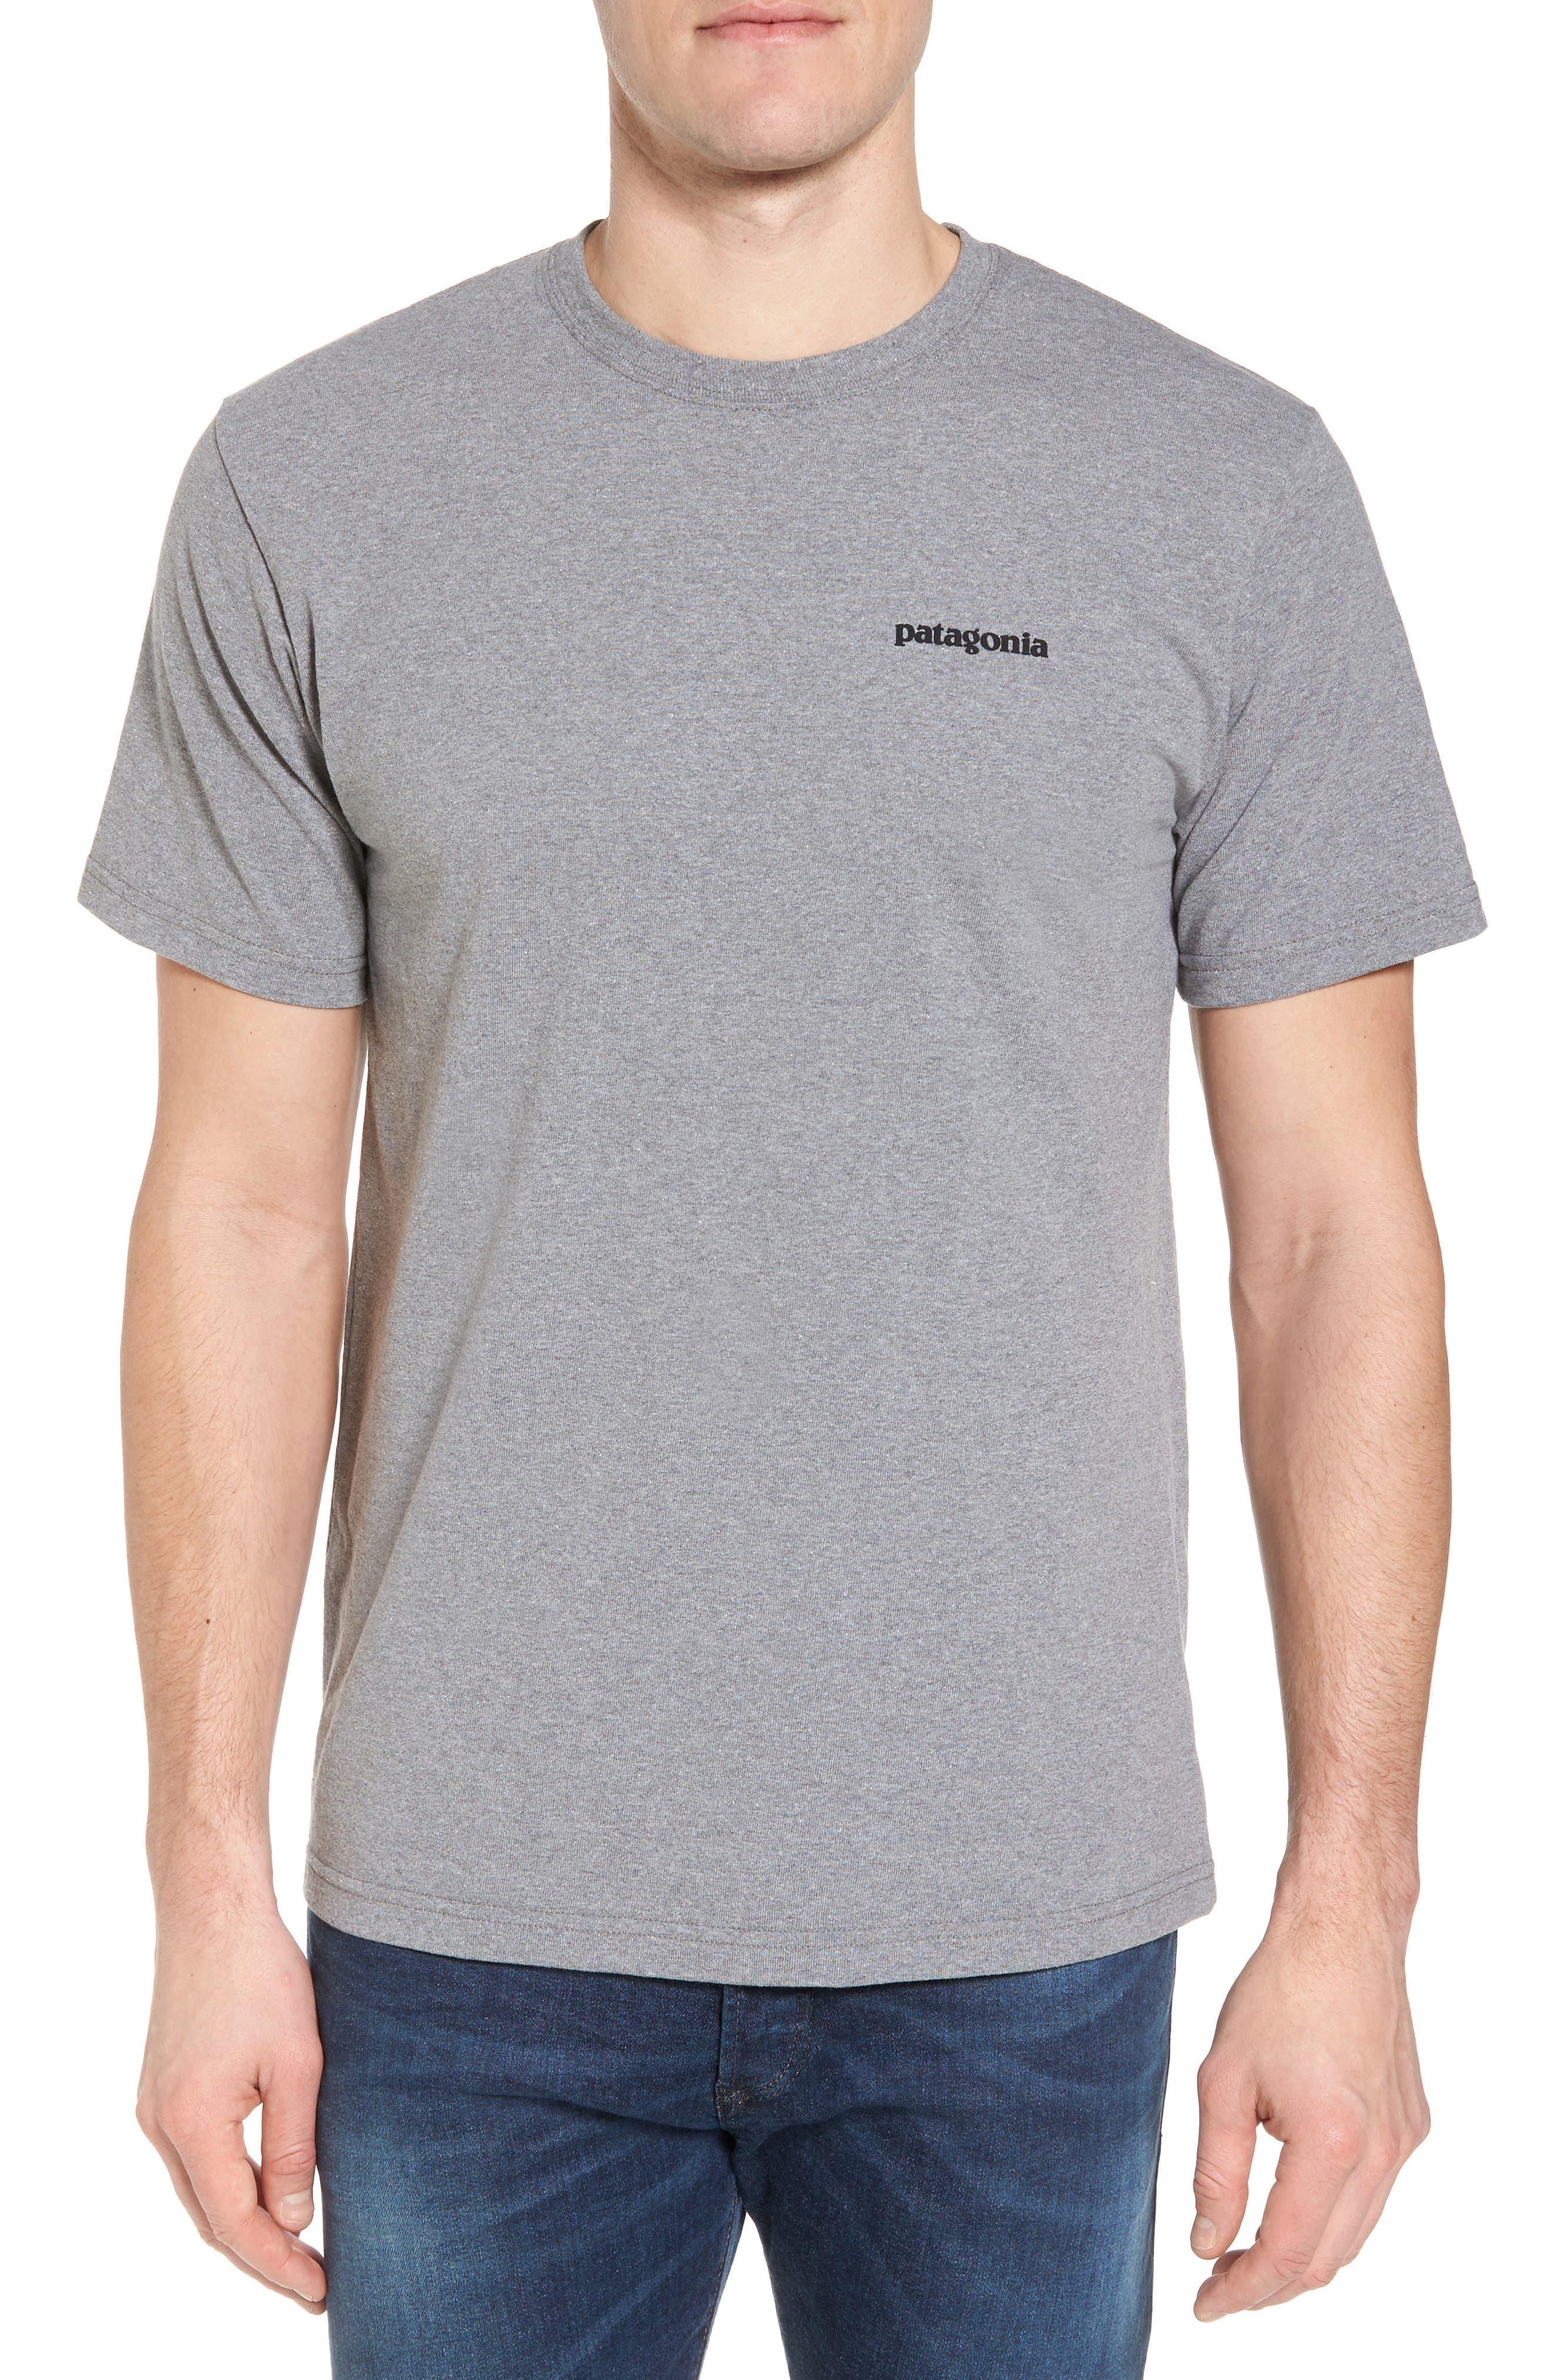 PATAGONIA, Responsibili-Tee T-Shirt, Main thumbnail 1, color, GRAVEL HEATHER